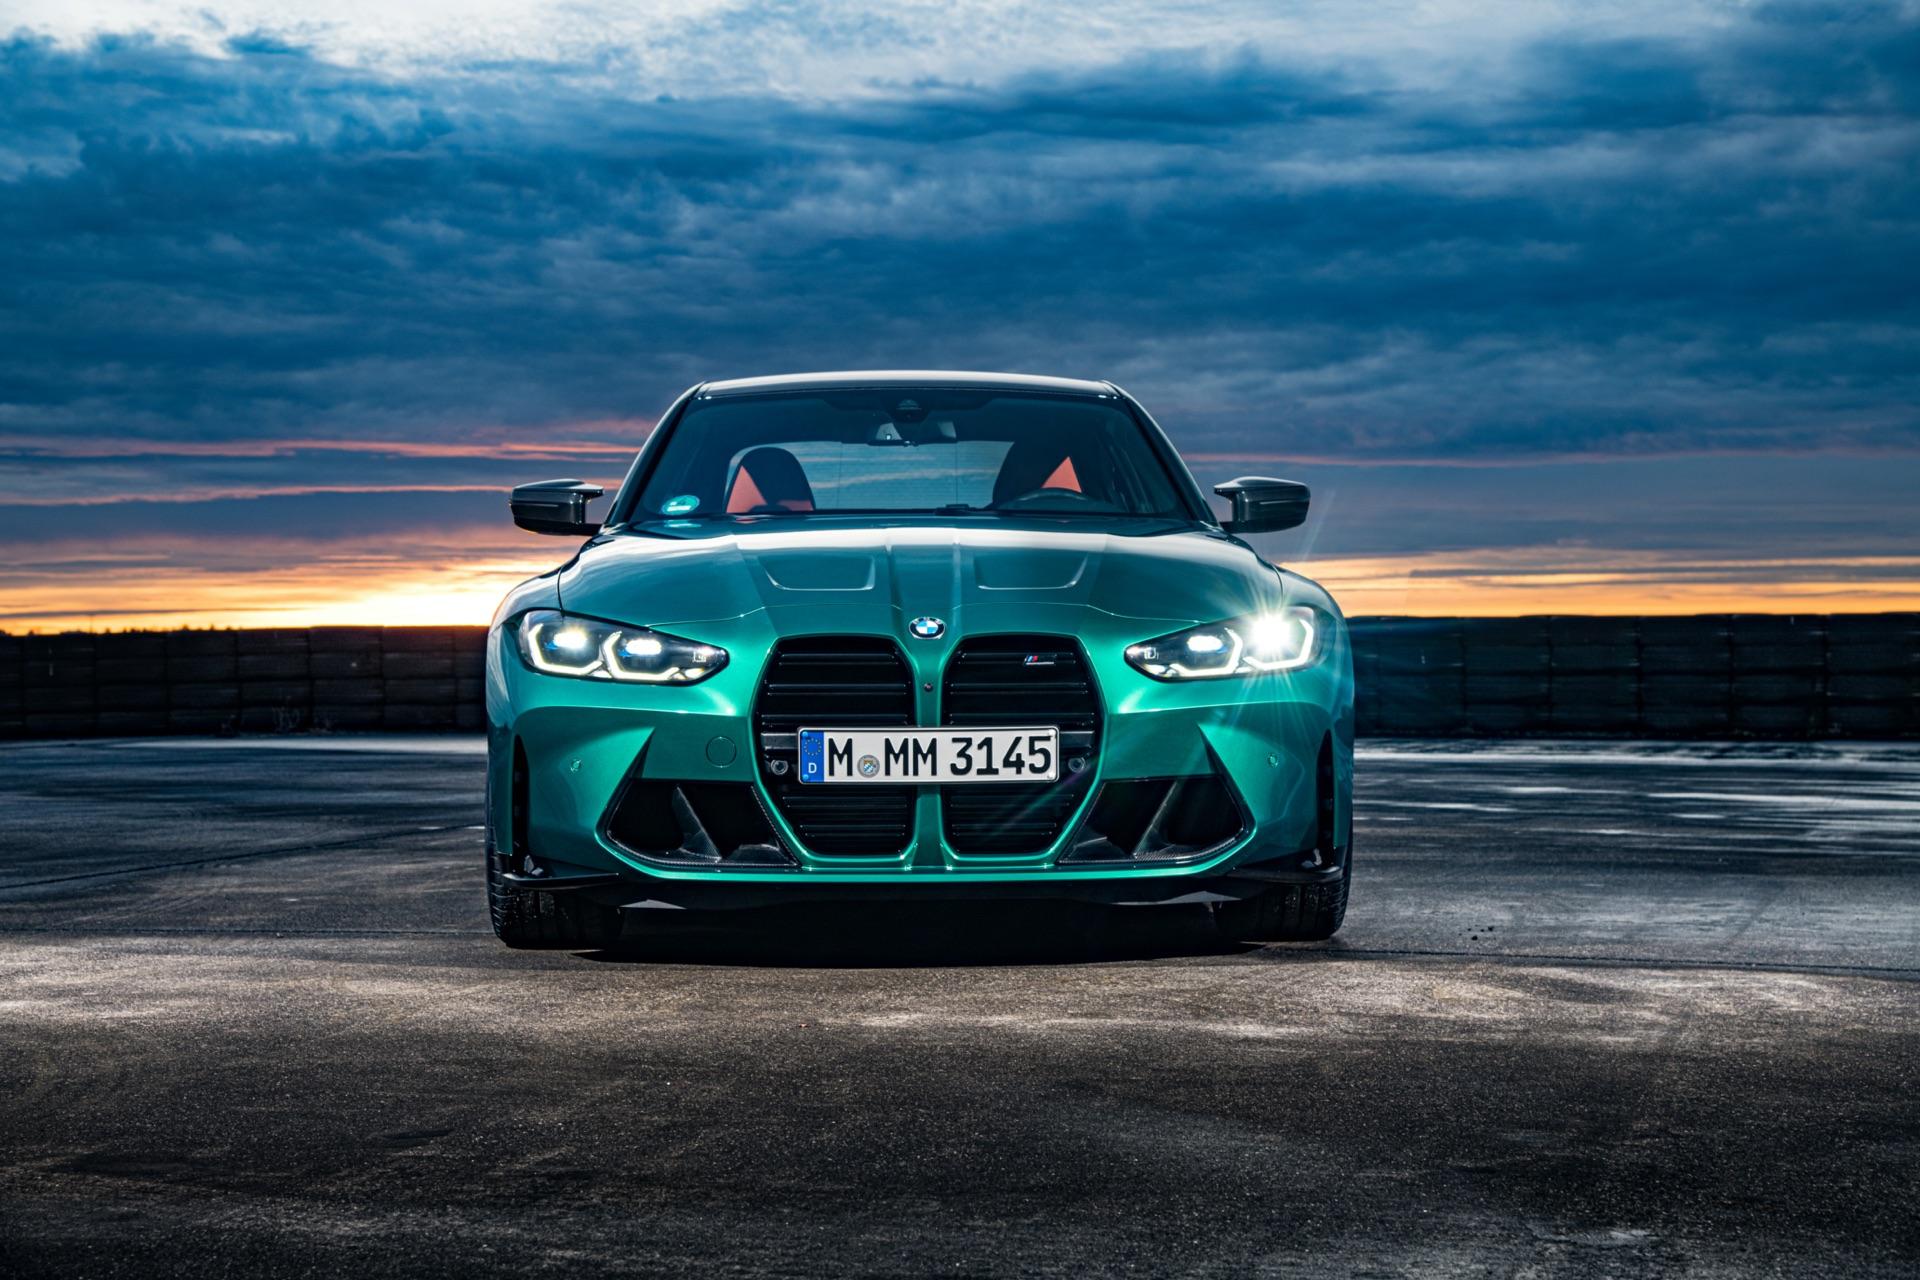 2022 BMW M3 front